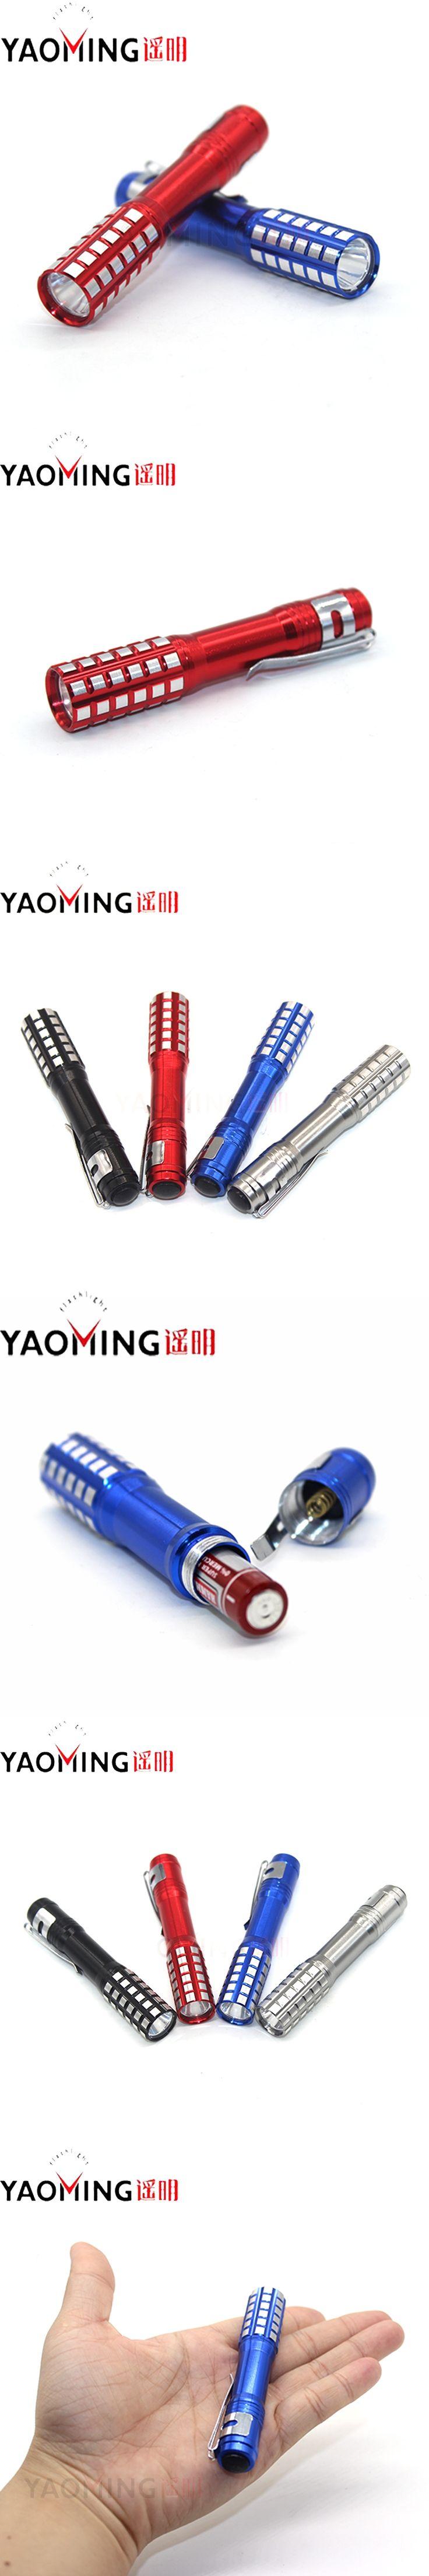 Mini Led Flashlight Torch Waterproof Lamp Light Camping Protable Linternas High Power Penlight Tactical Flashlight by AAA